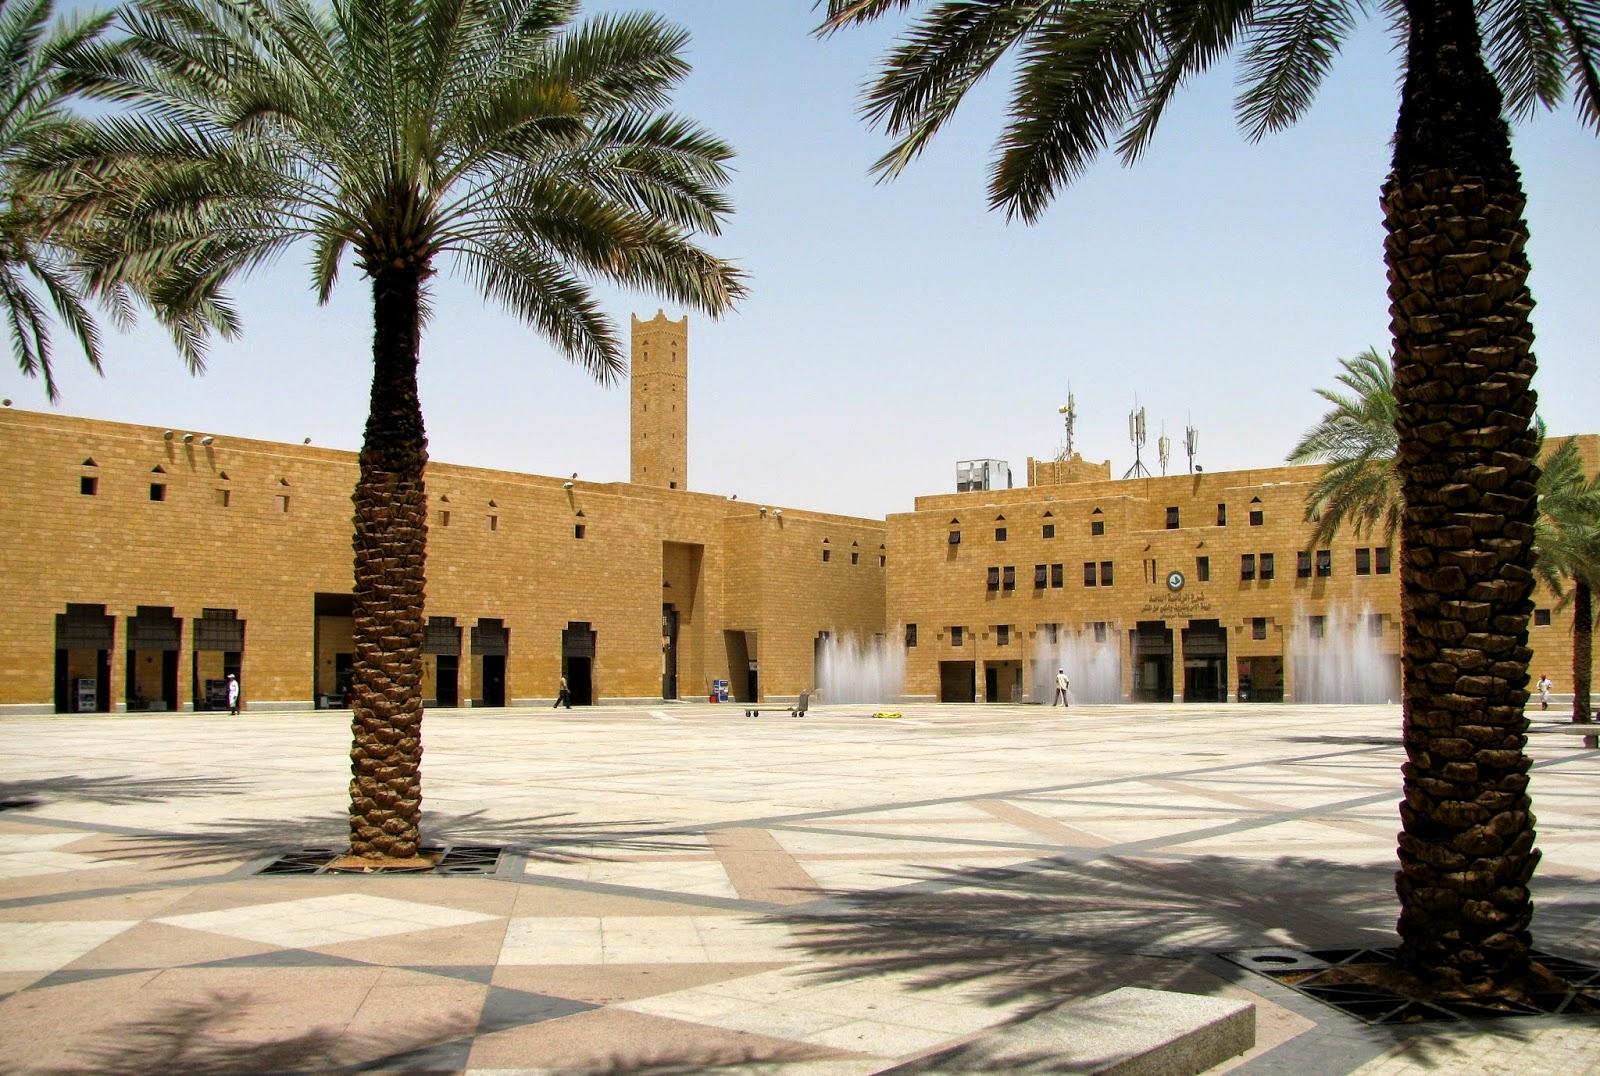 Het Al Safa-plein in het oude centrum van Riyad